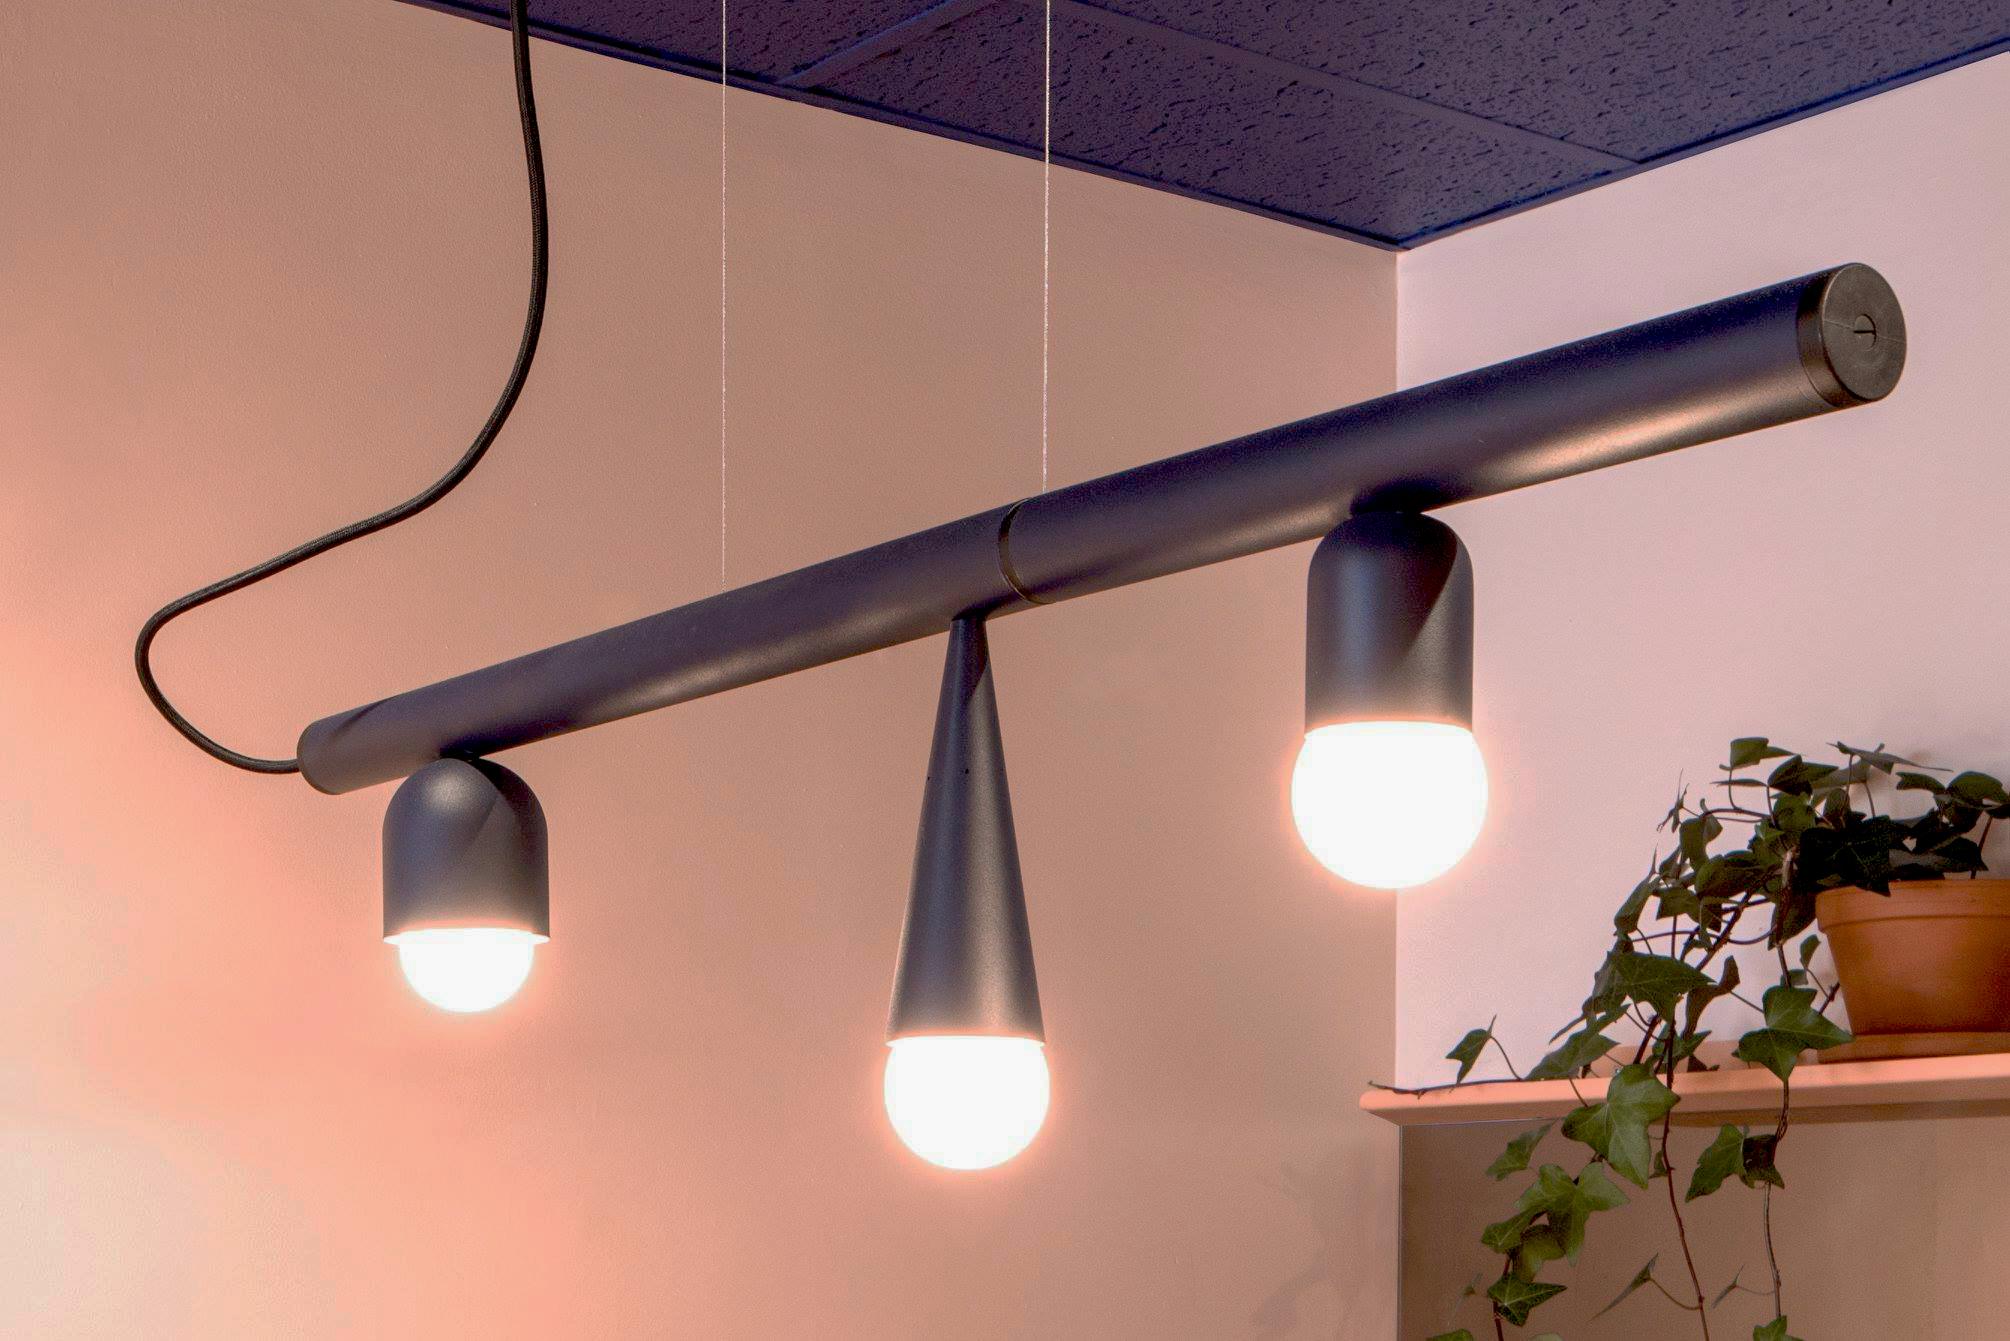 Baltic-Club_studio-botte_gotas1_luminaire_lampe_lamp.jpg